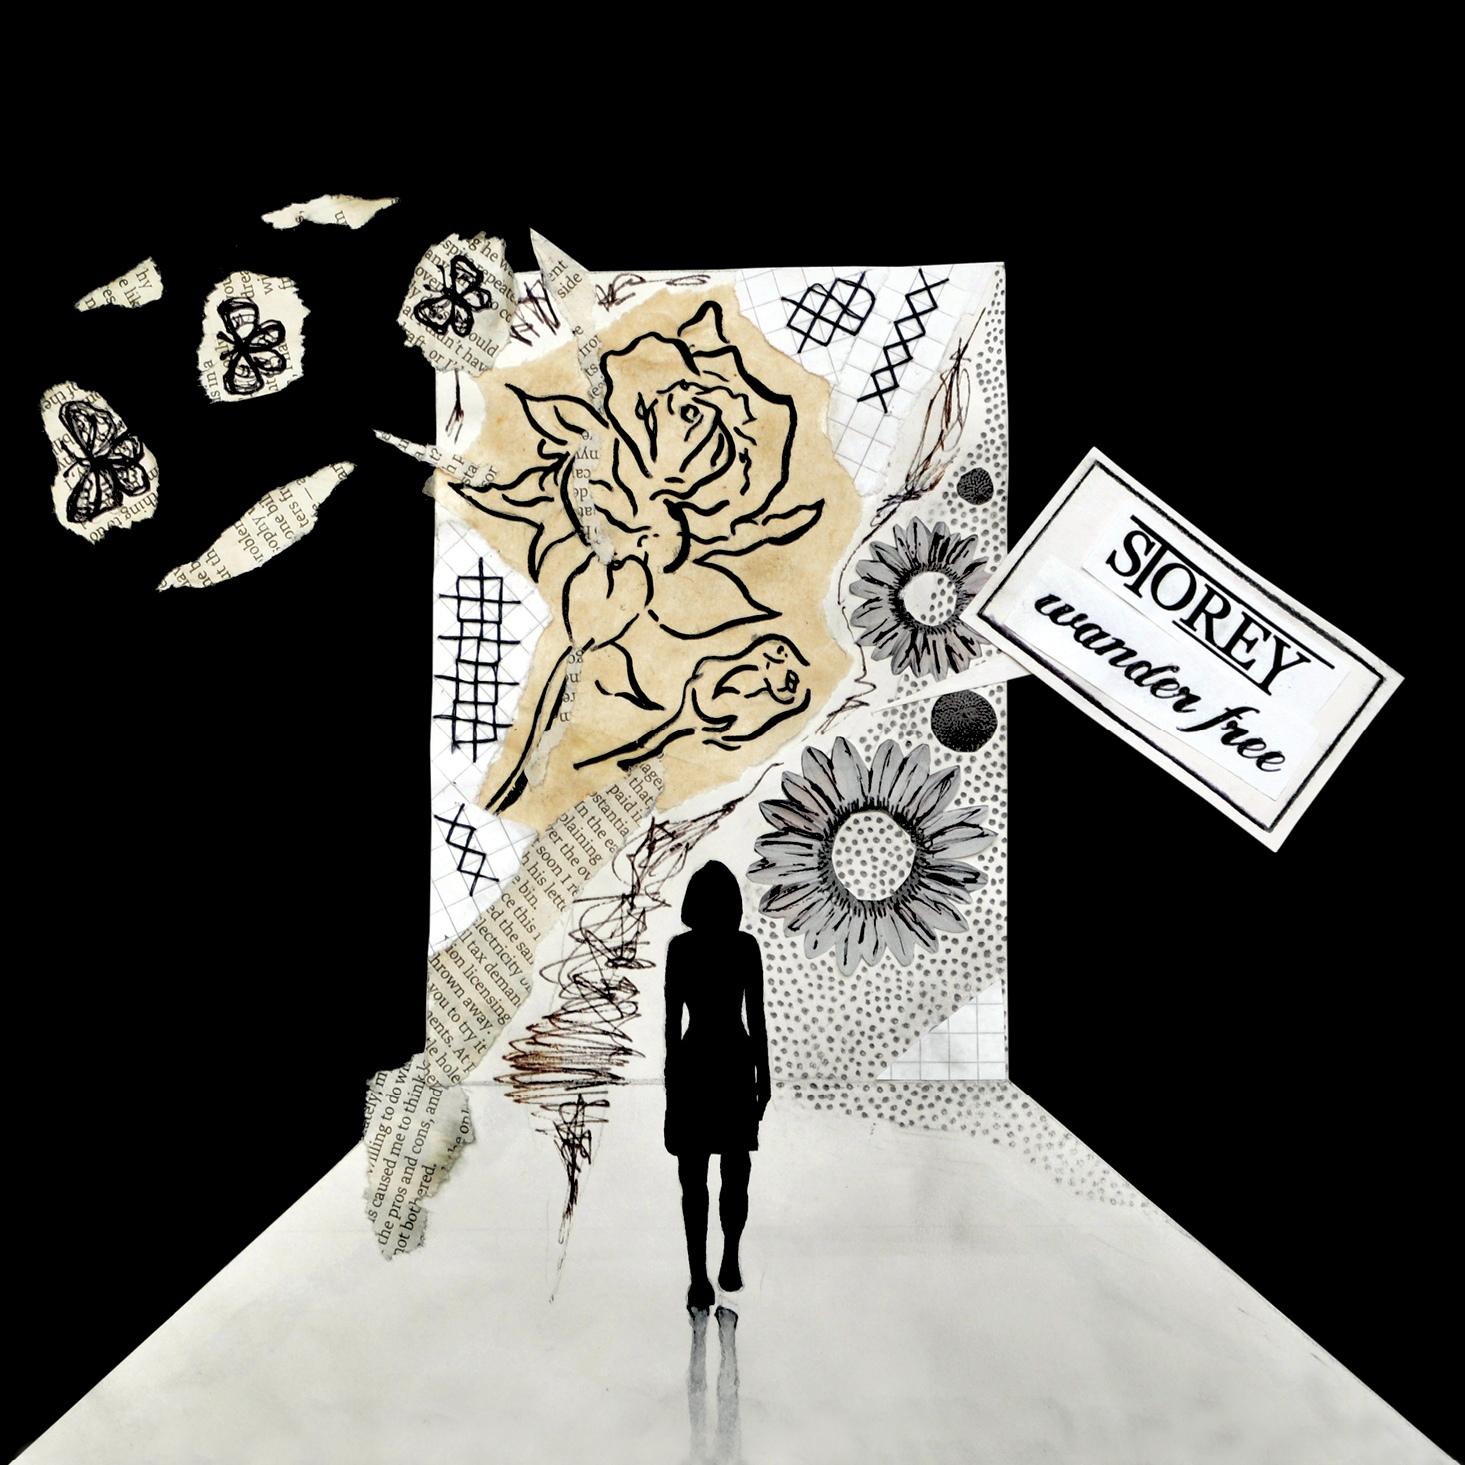 Storey - Wander Free. Produced & lyrics by Arron Storey